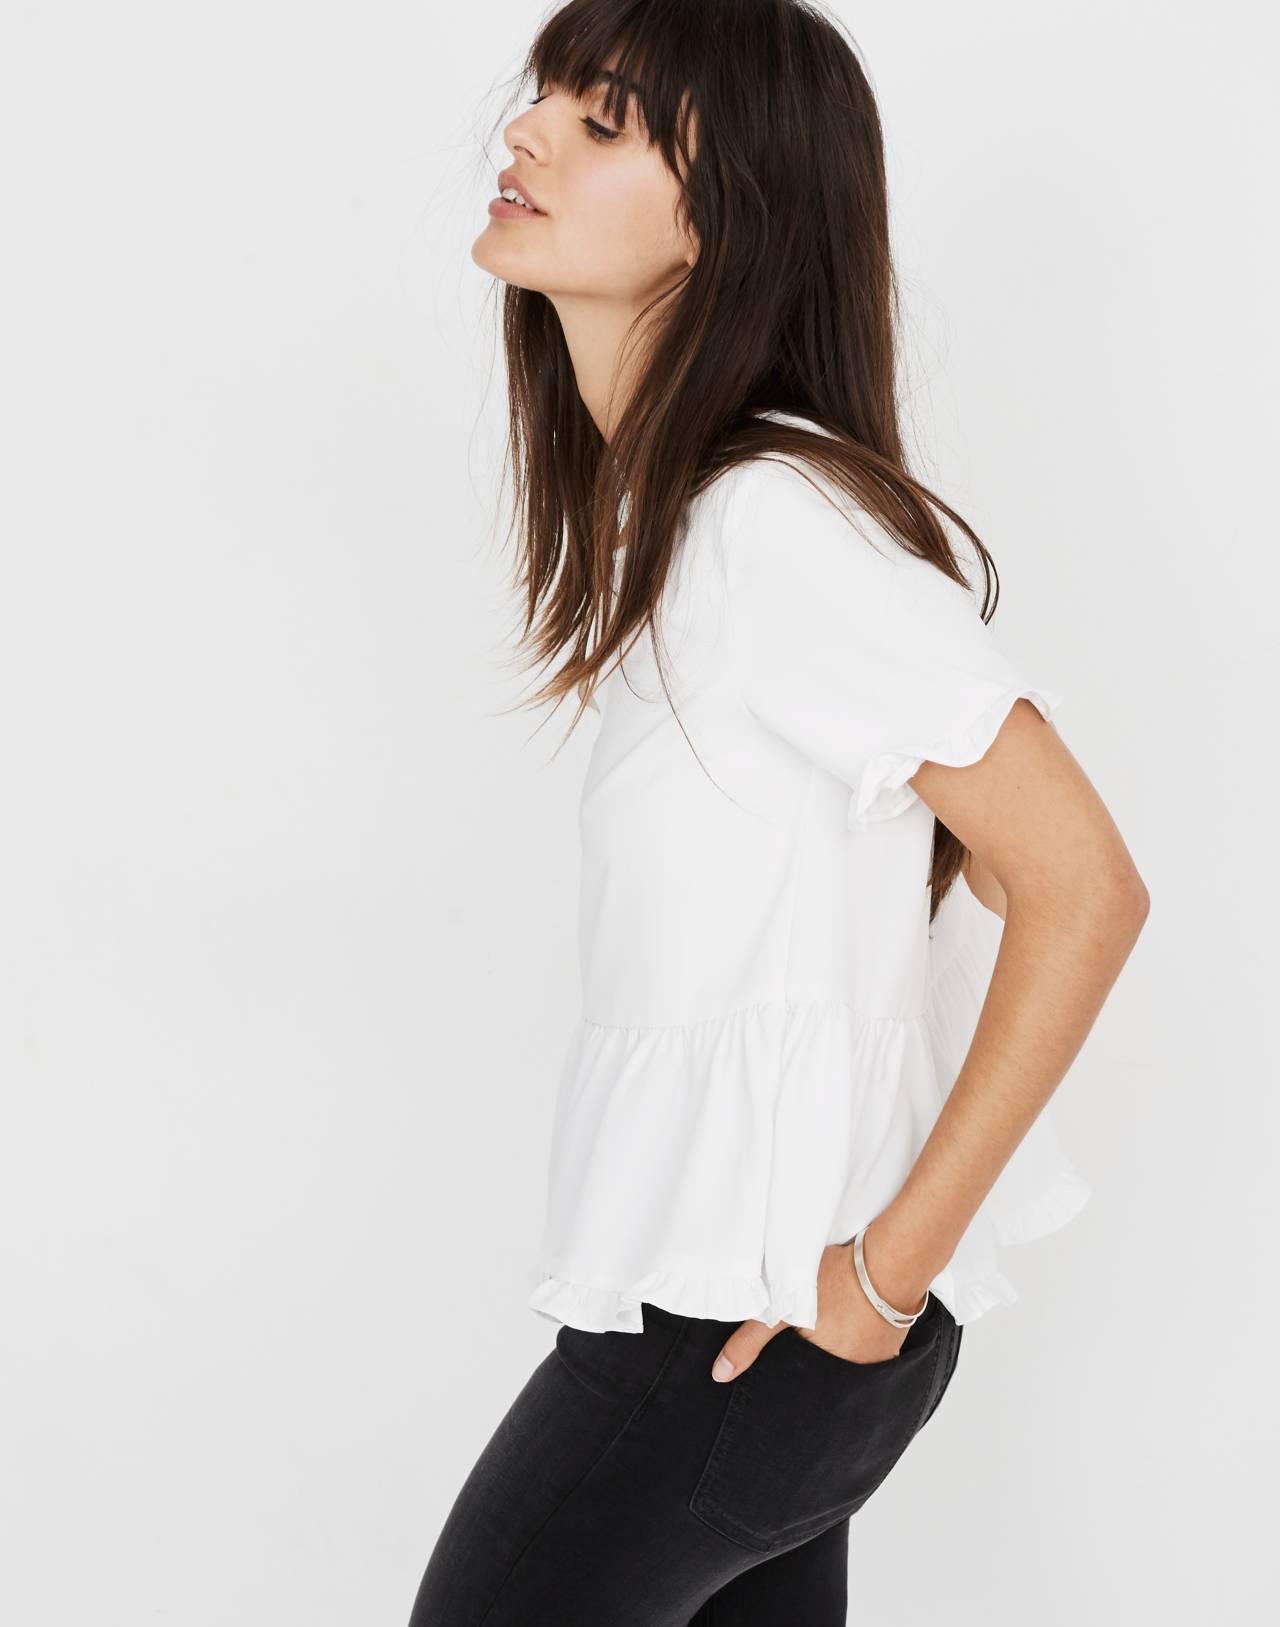 Stanza Ruffle-Hem Top in white nappa image 3